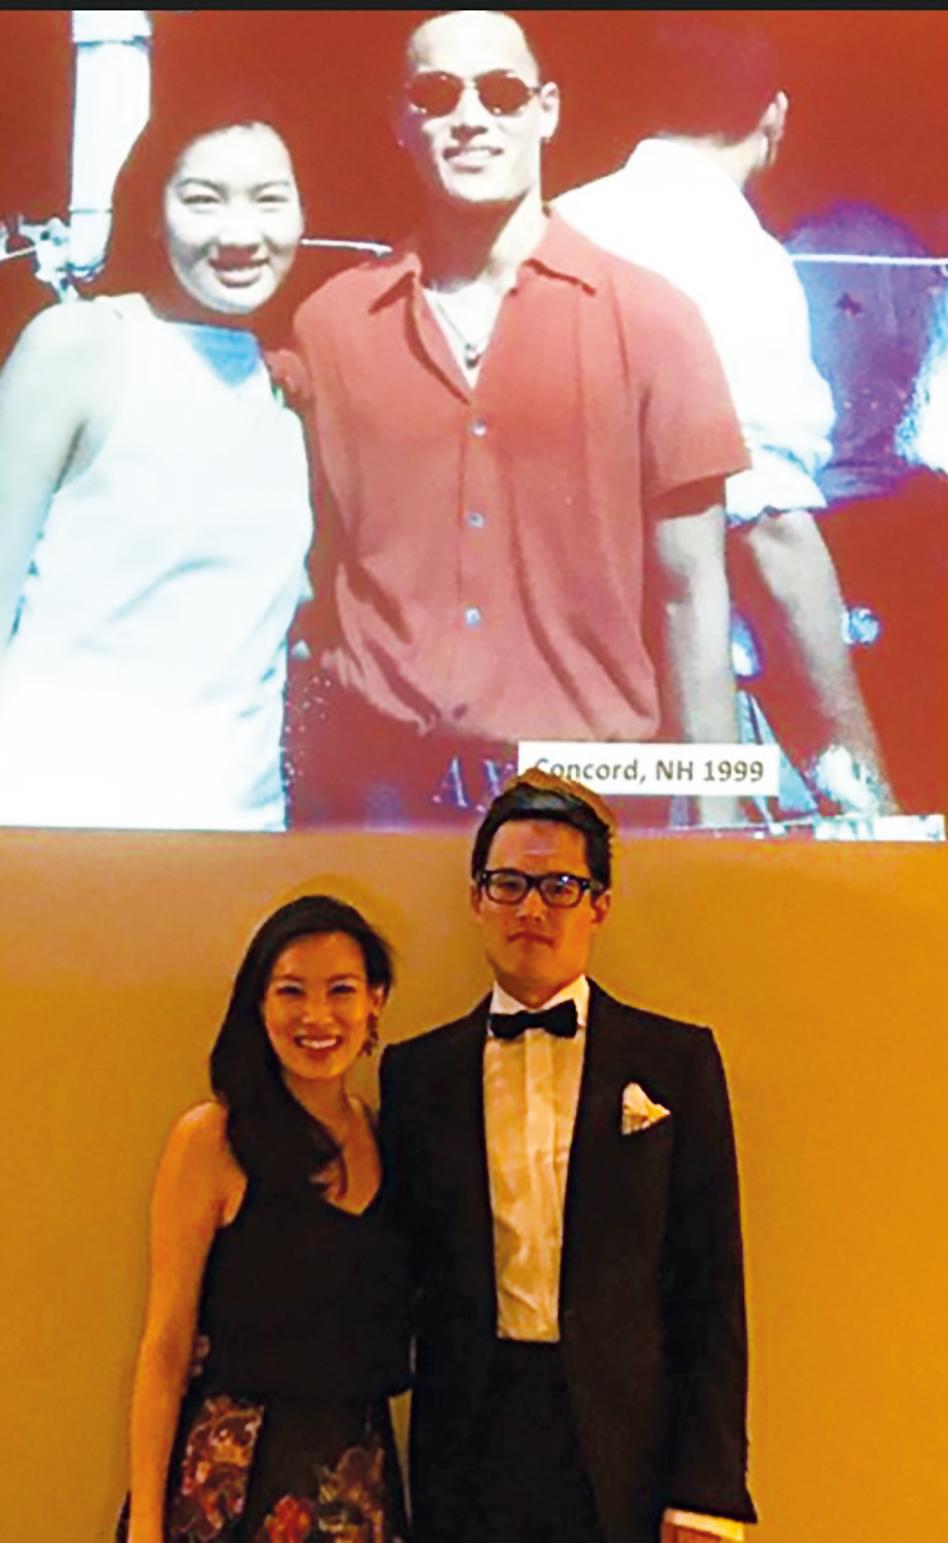 Joyce Tam '99 (l.) and Sun Chuan Dai '98 recreate a photo taken at Joyce's graduation from SPS.